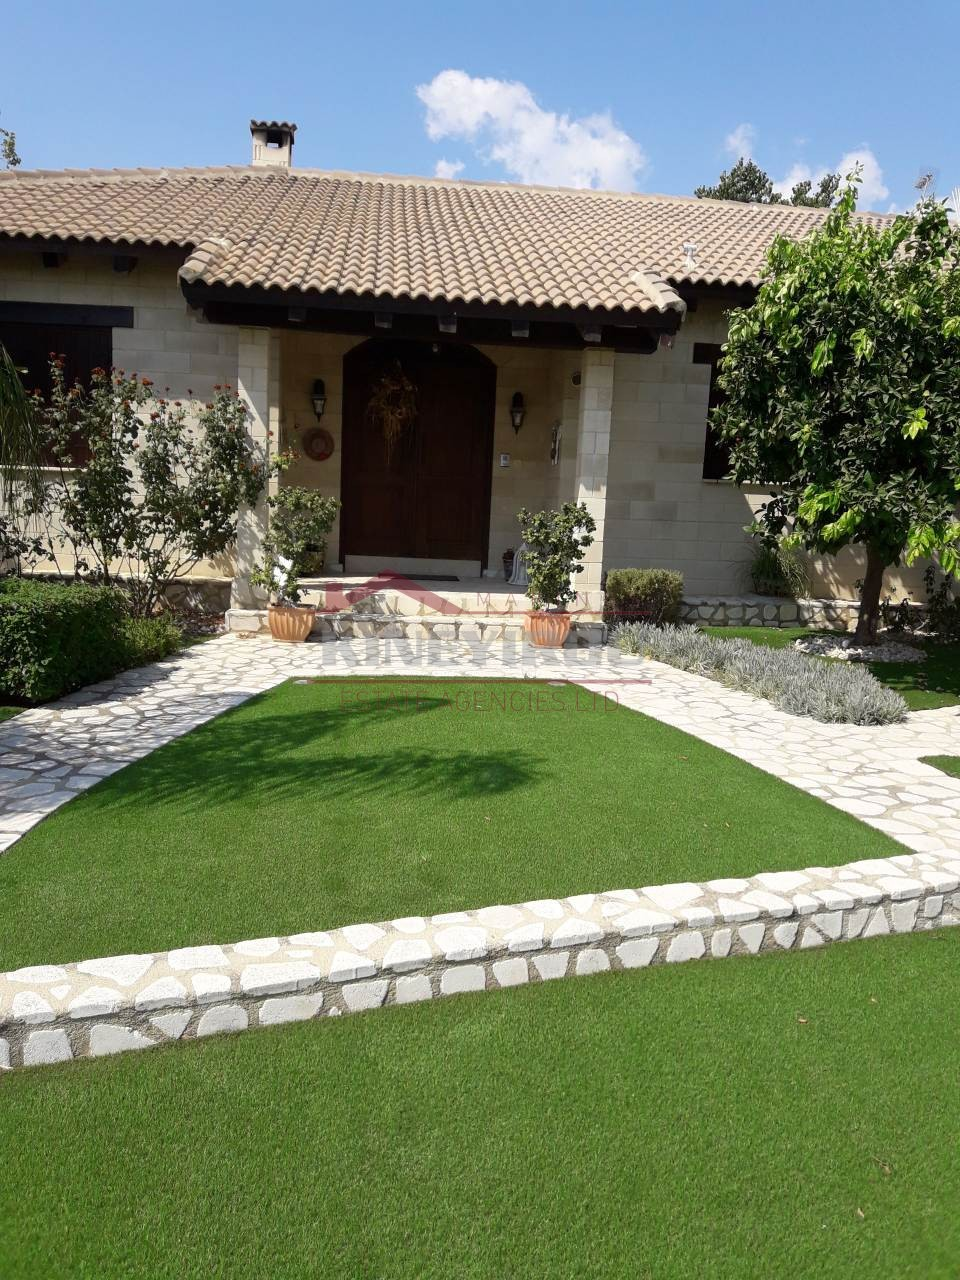 Four bedroom, bungalow house in Oroklini , Larnaca